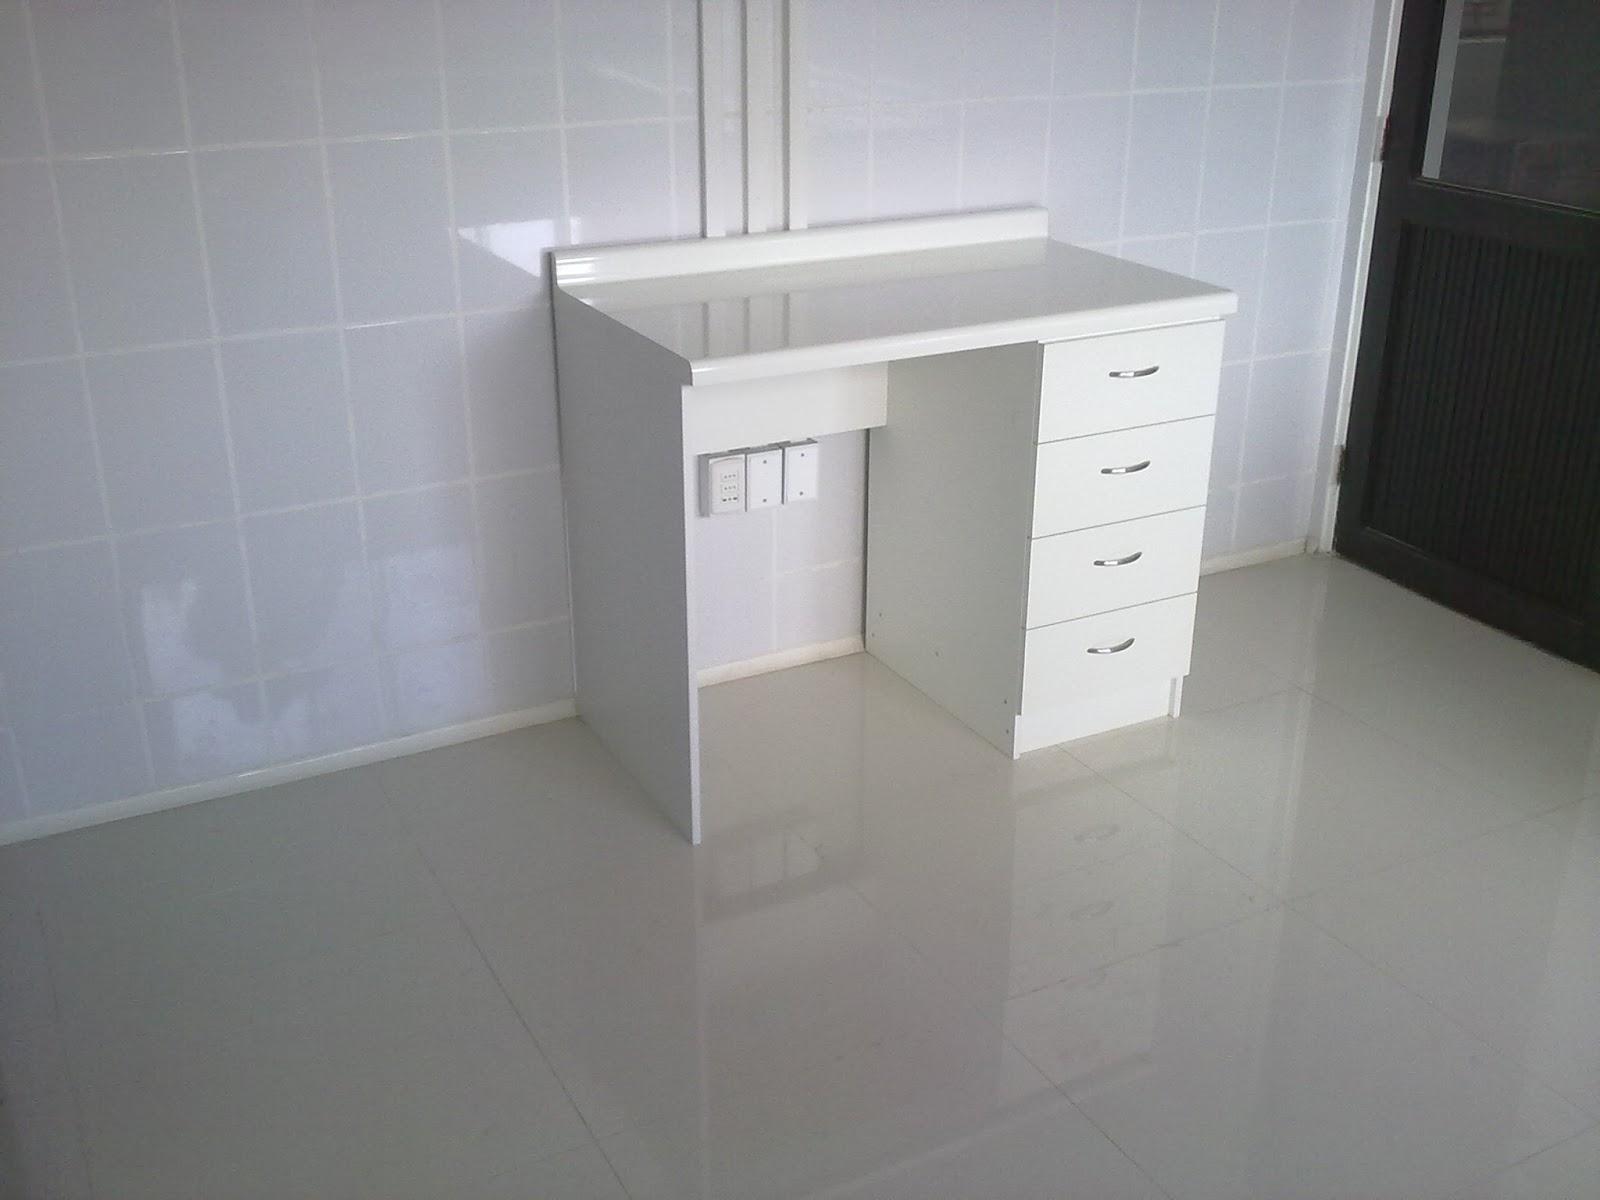 fotos de muebles de oficina - TP Fotos de Muebles para oficina modernos